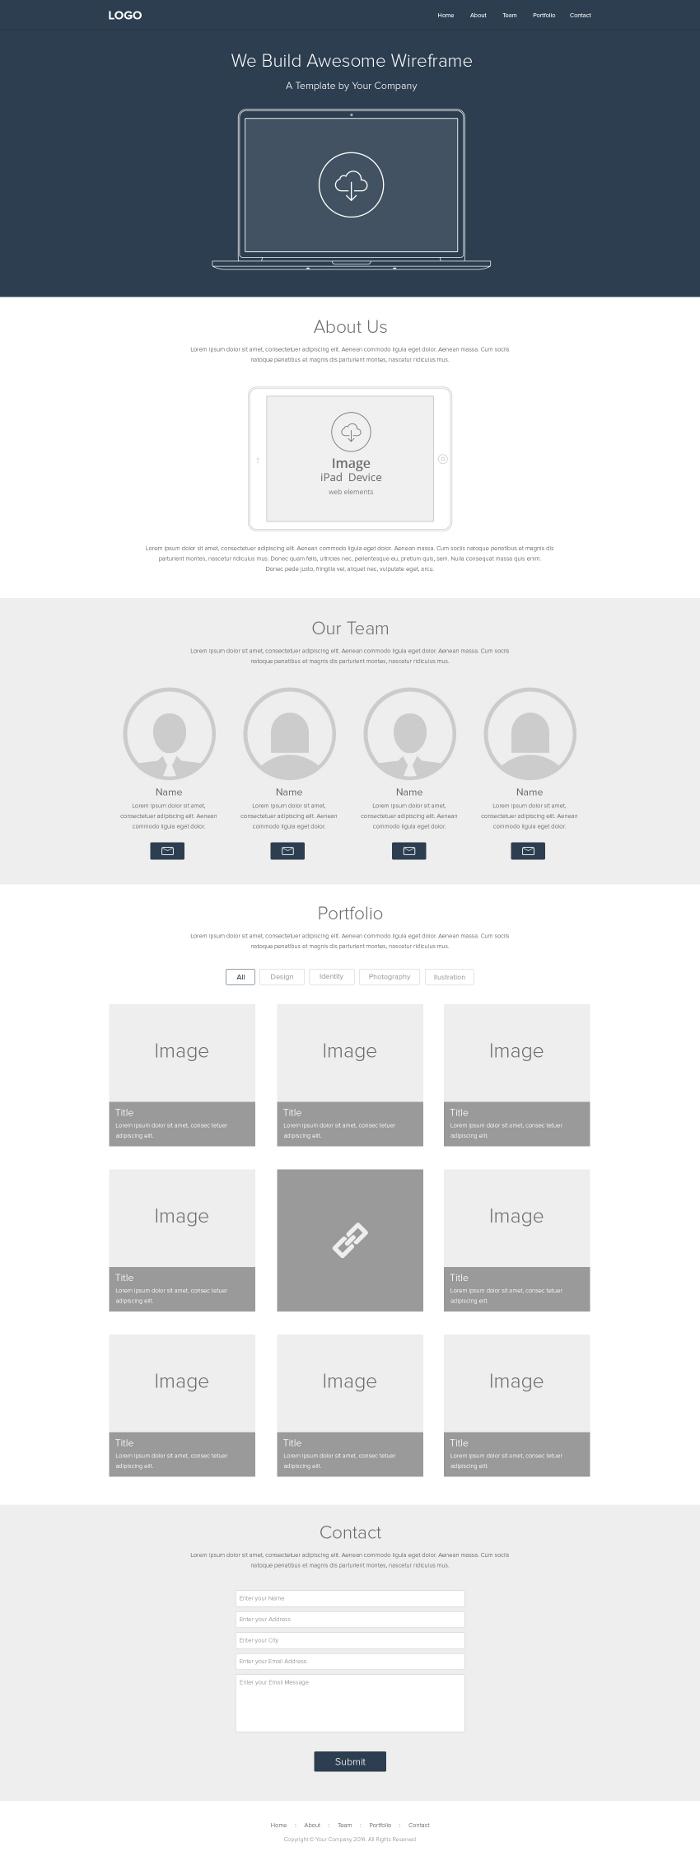 Free website wireframe design tool